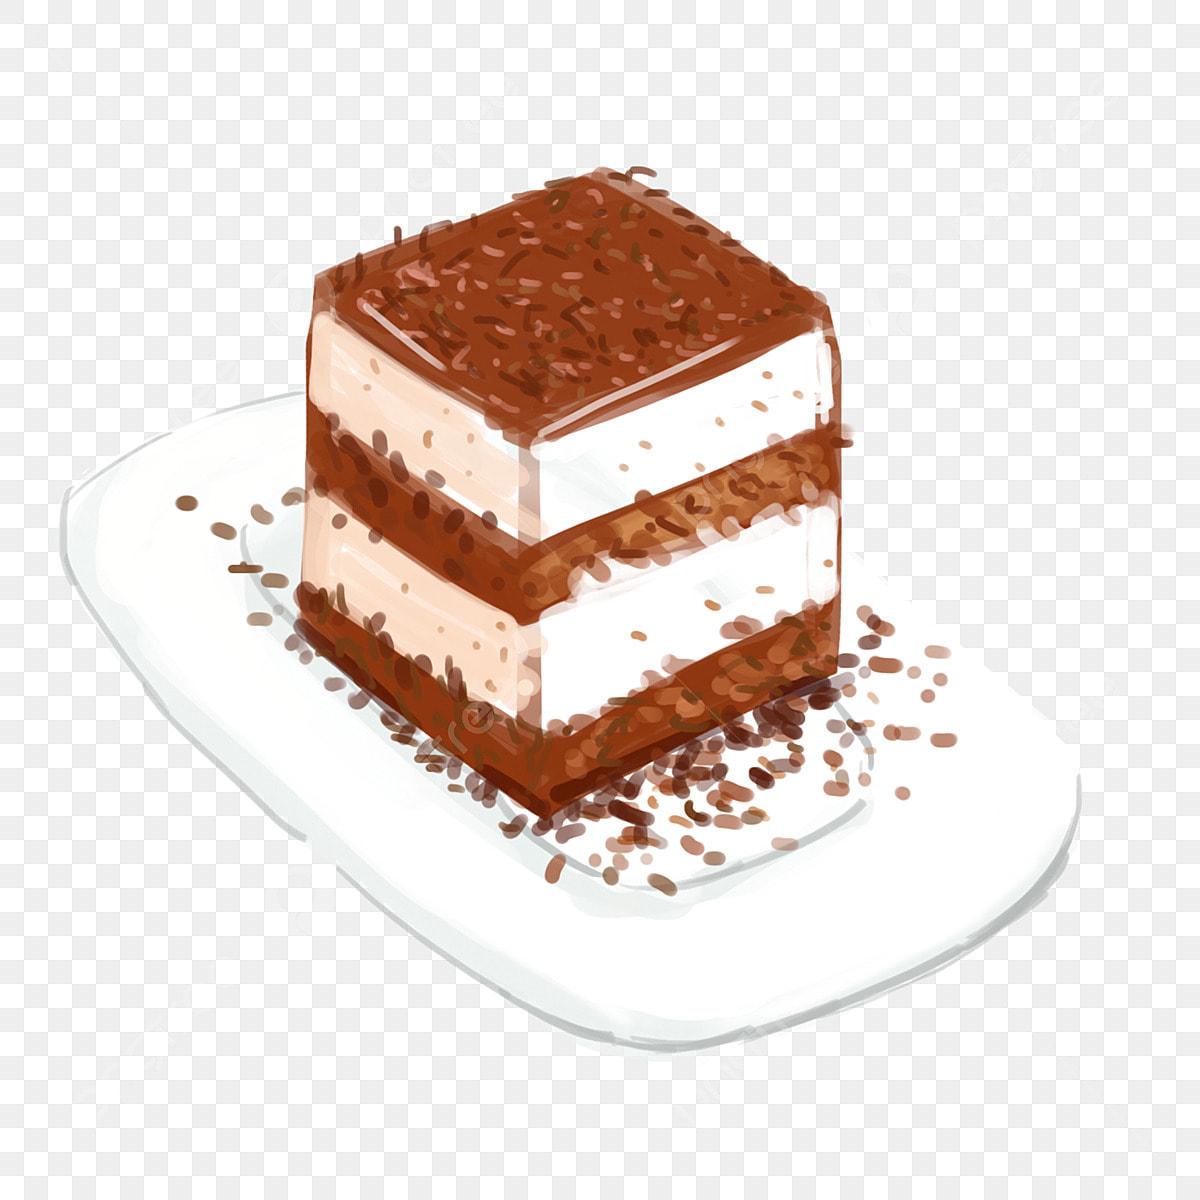 Element De Gateau Au Chocolat Creme Dessine Main Dessin Anime